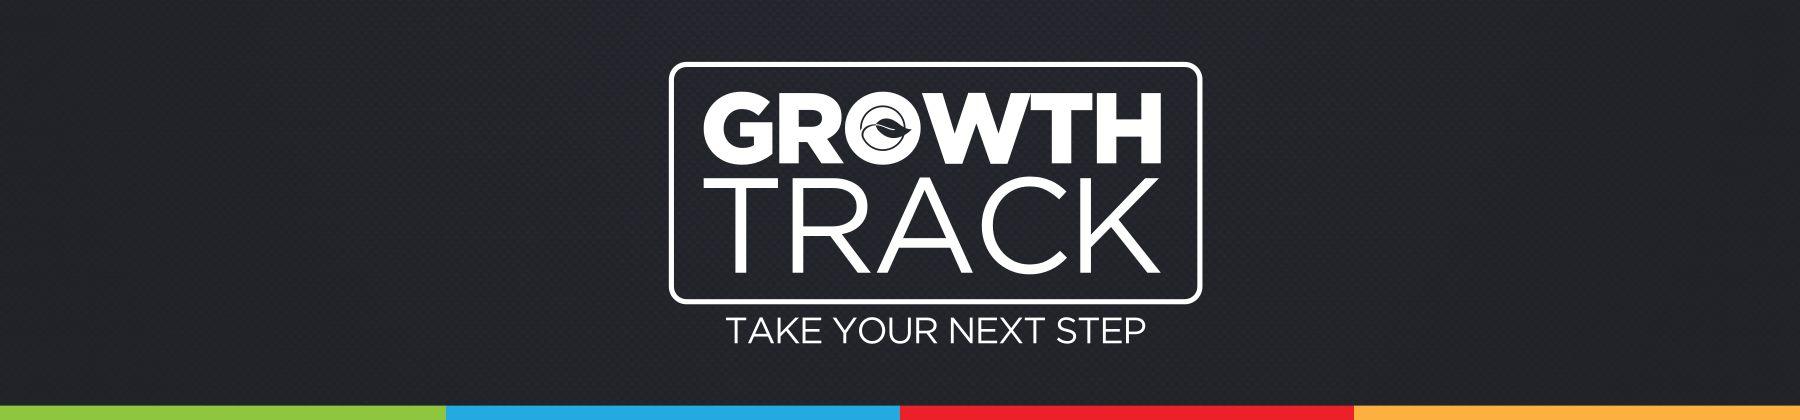 Groth-Track-banner-wide-compressed